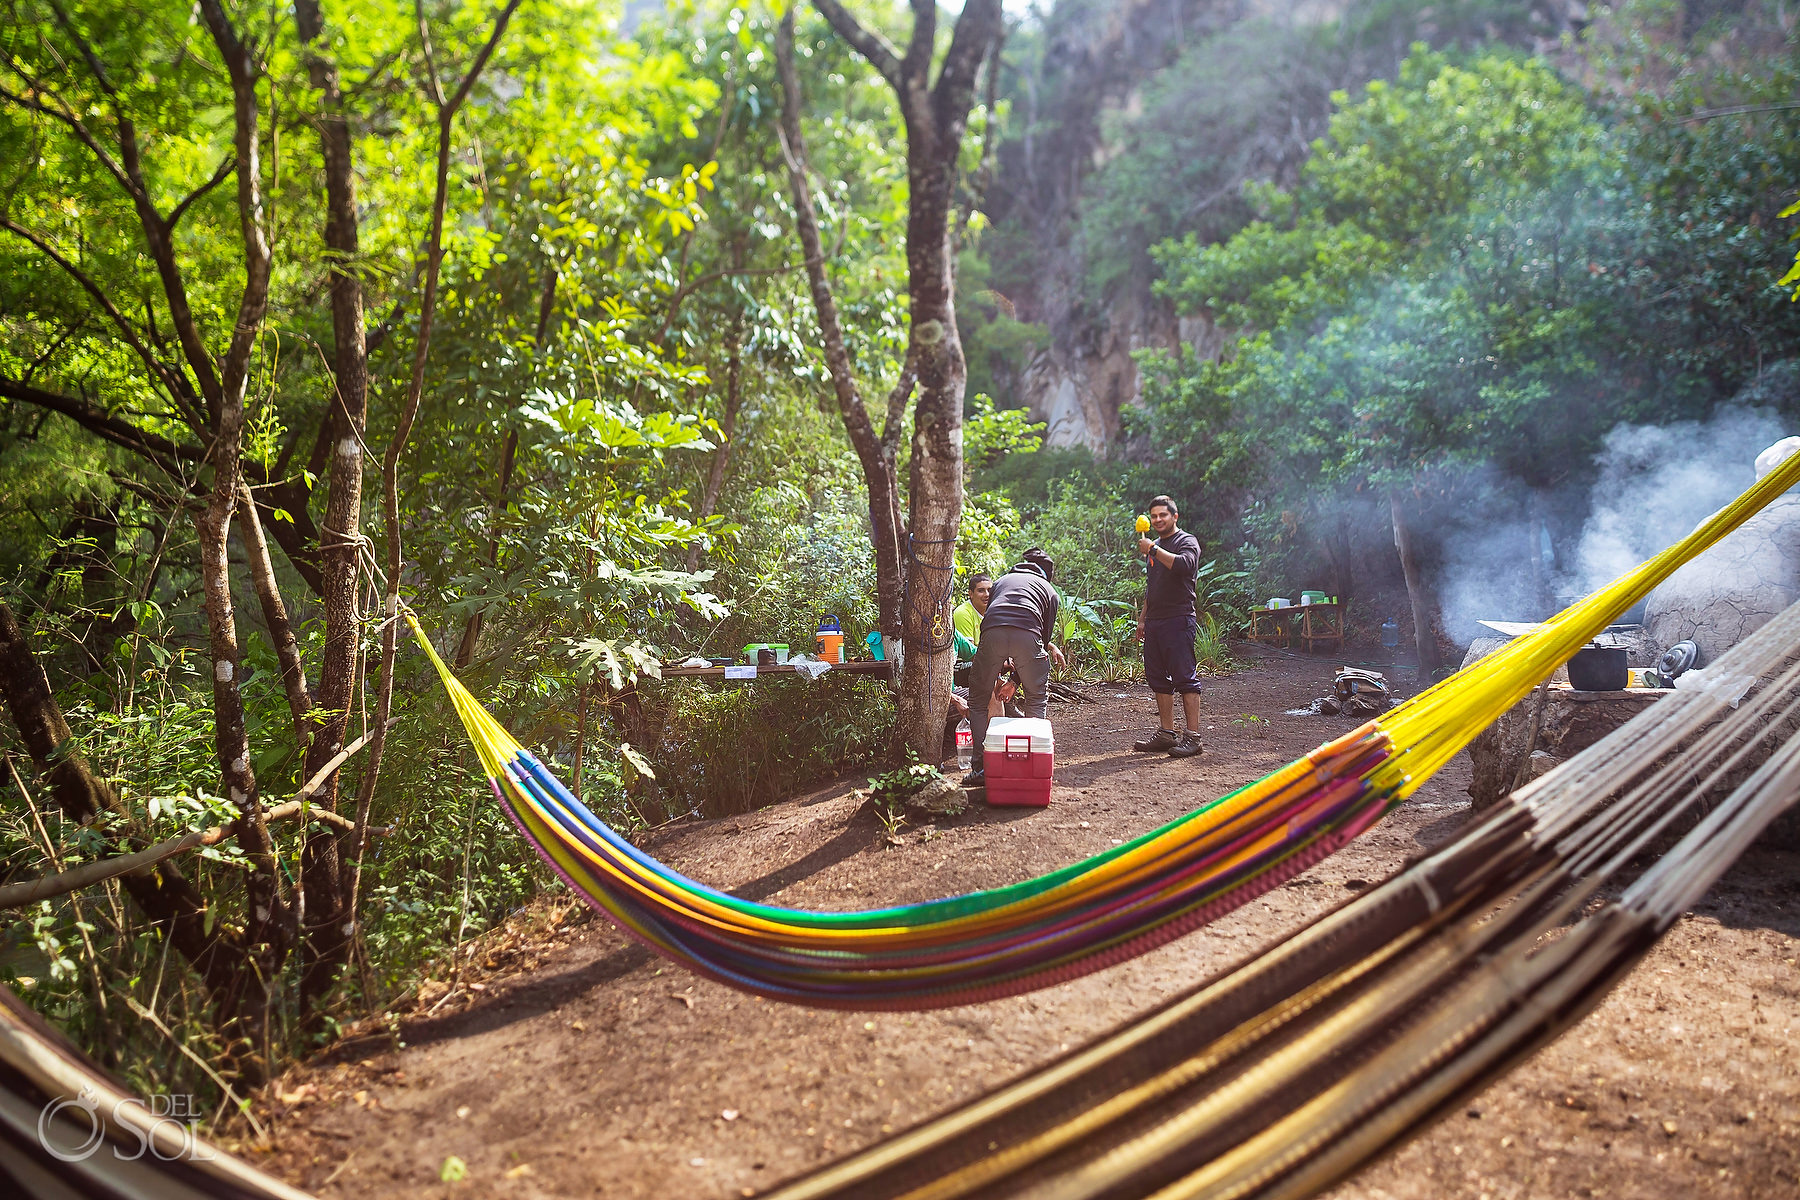 hammocks hanging across campsite Chiapas waterfall adventure